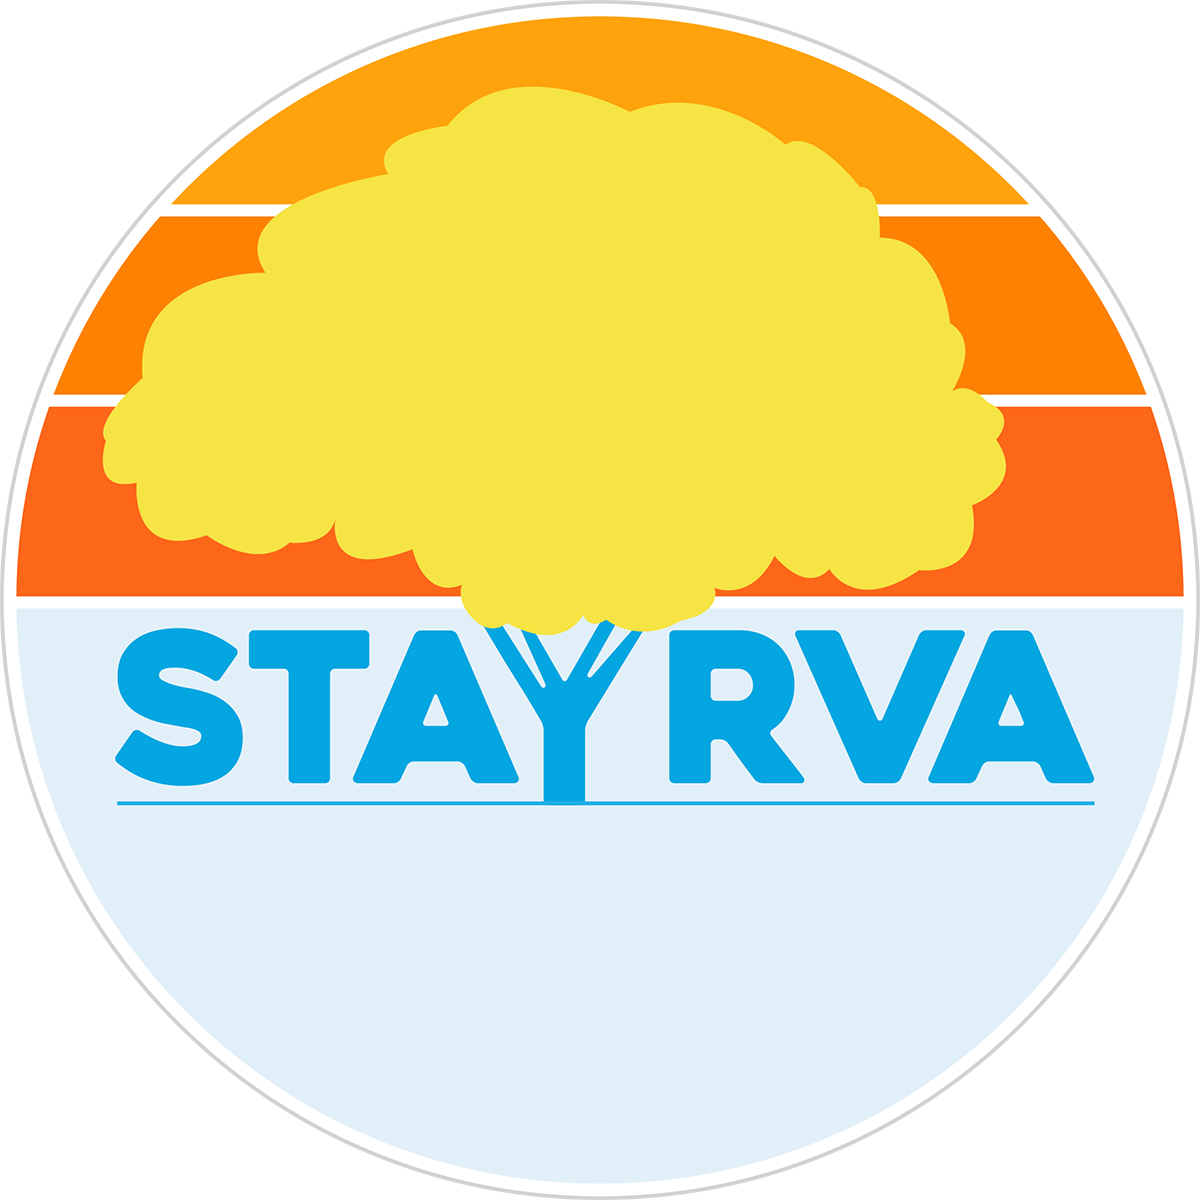 stay rva logo